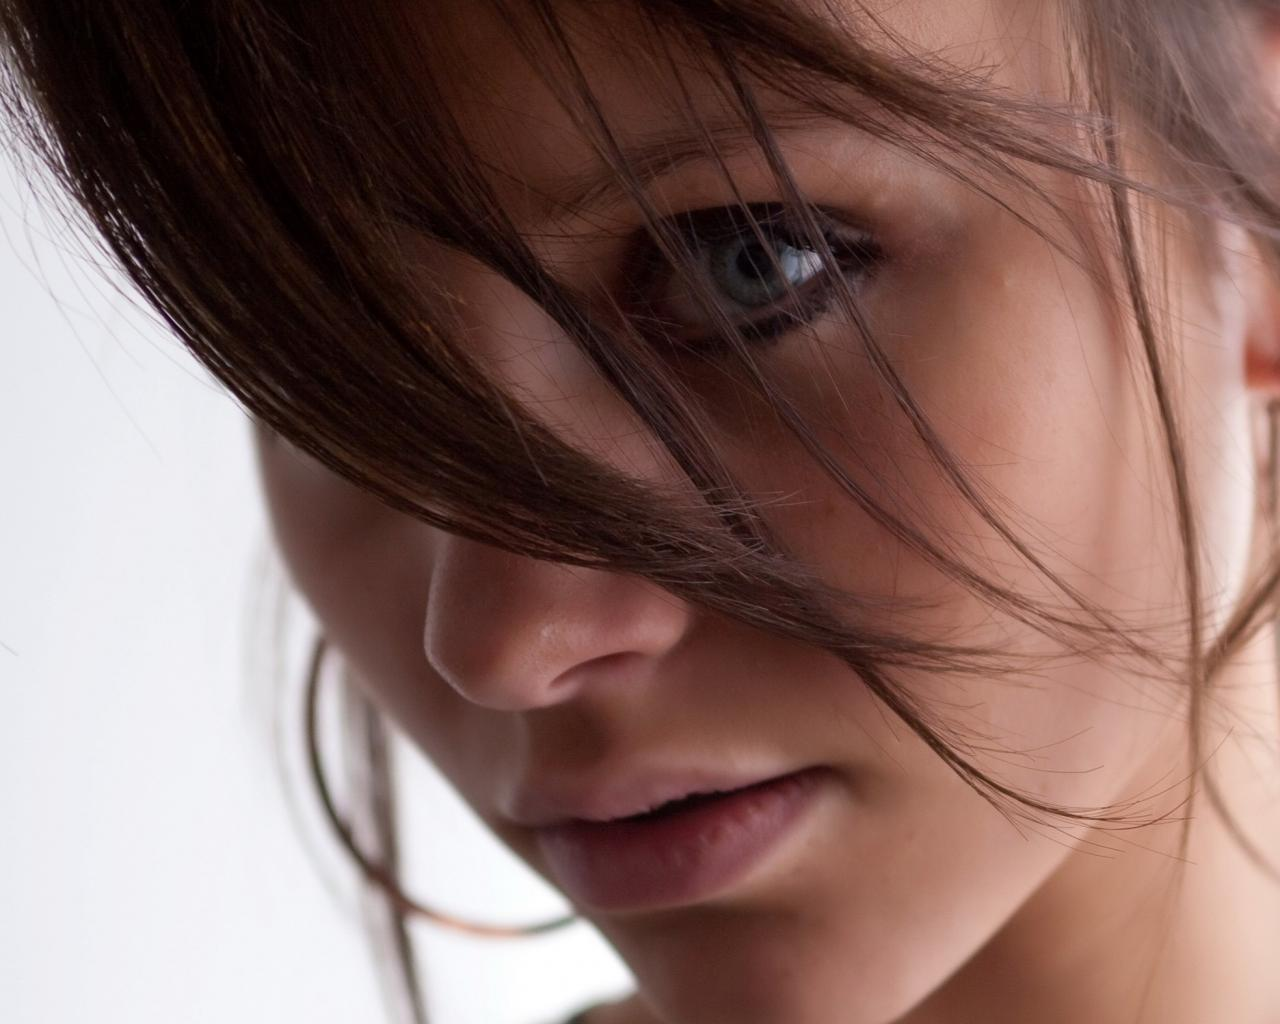 фото краствых девушек брюнеток: